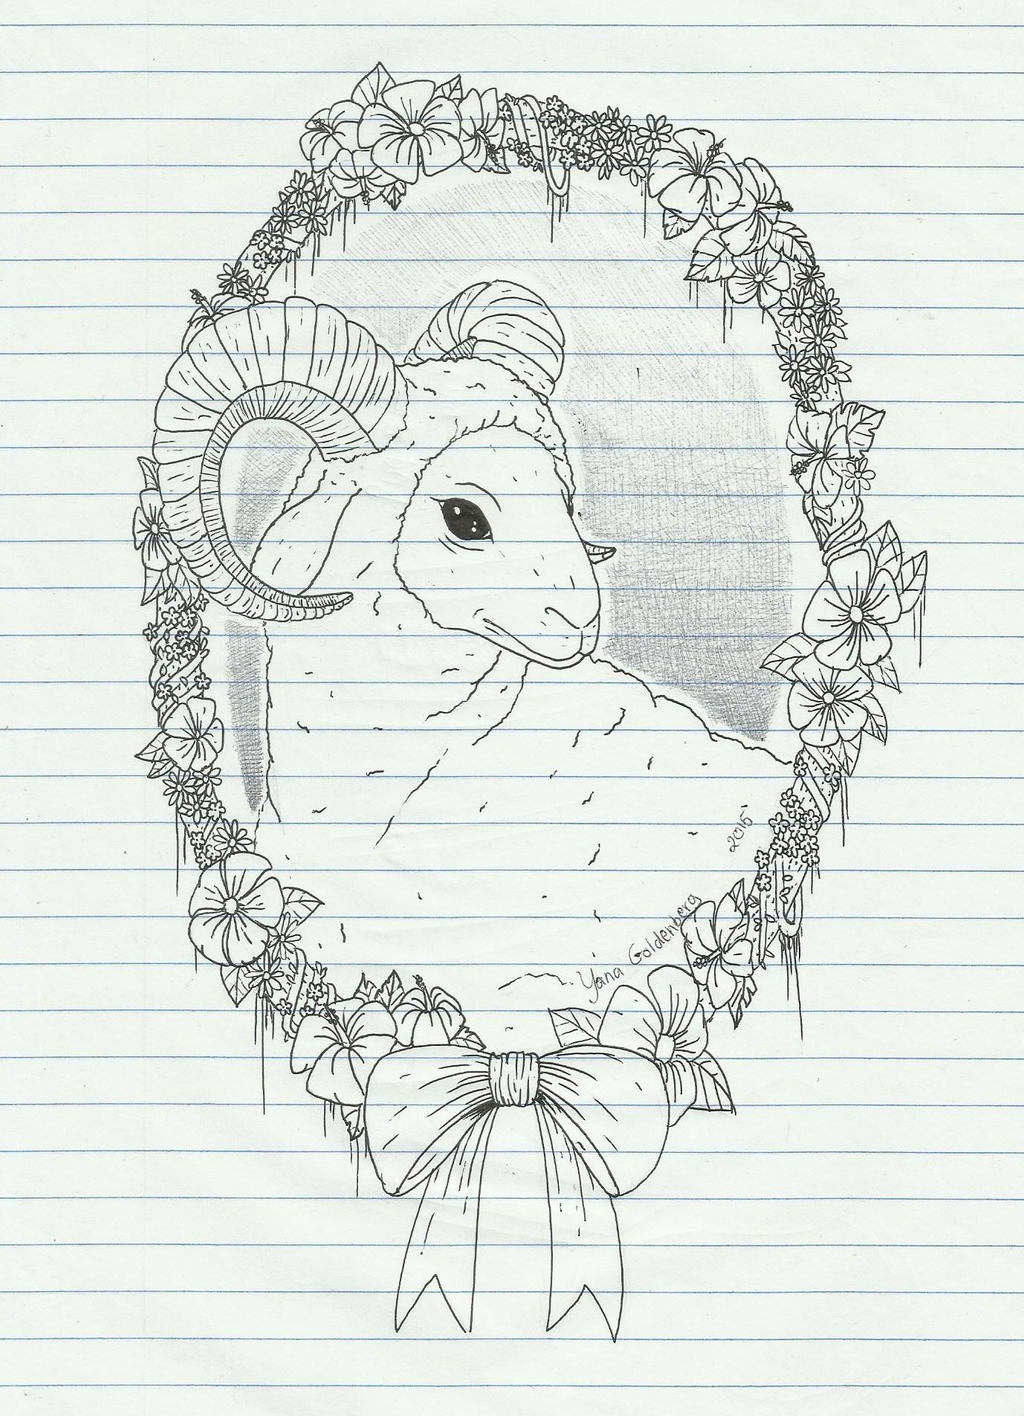 Sheep by ItsMyUsername